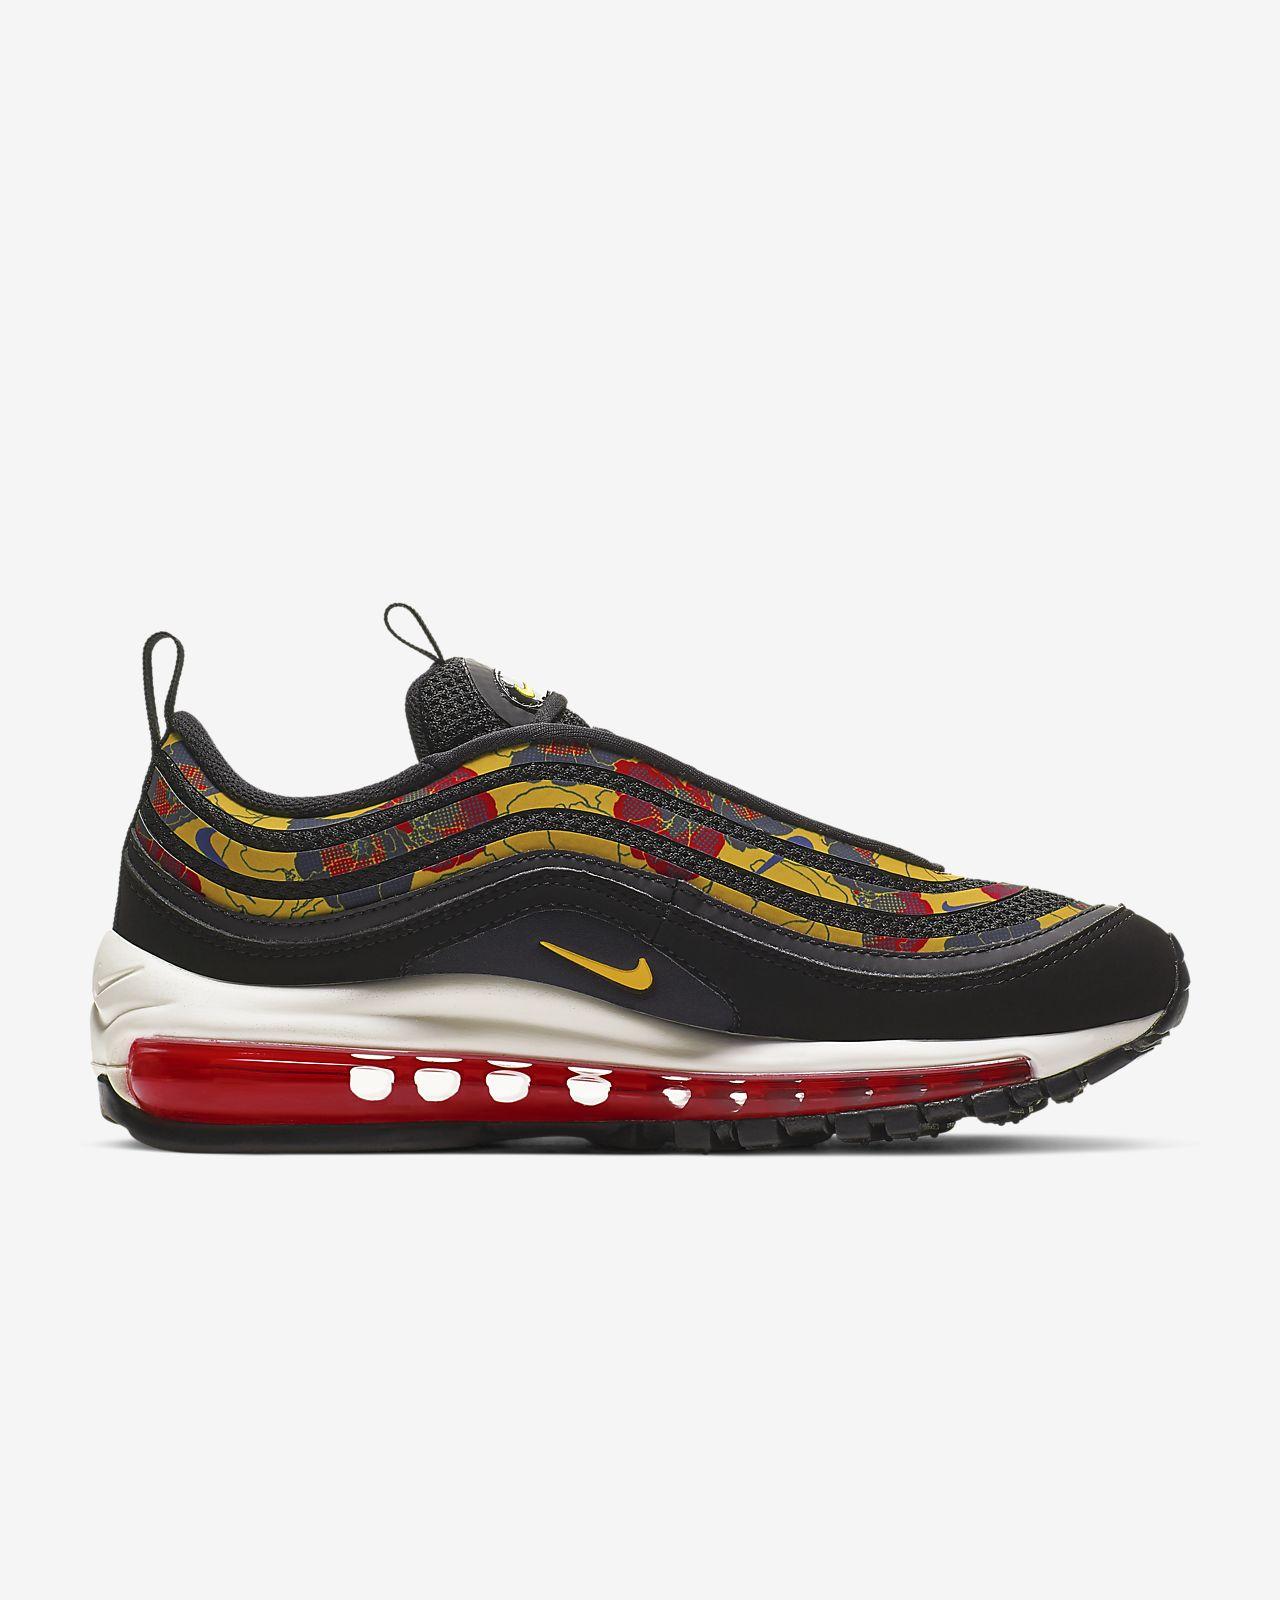 big sale ab78b 8765e ... Nike Air Max 97 SE Floral Women s Shoe